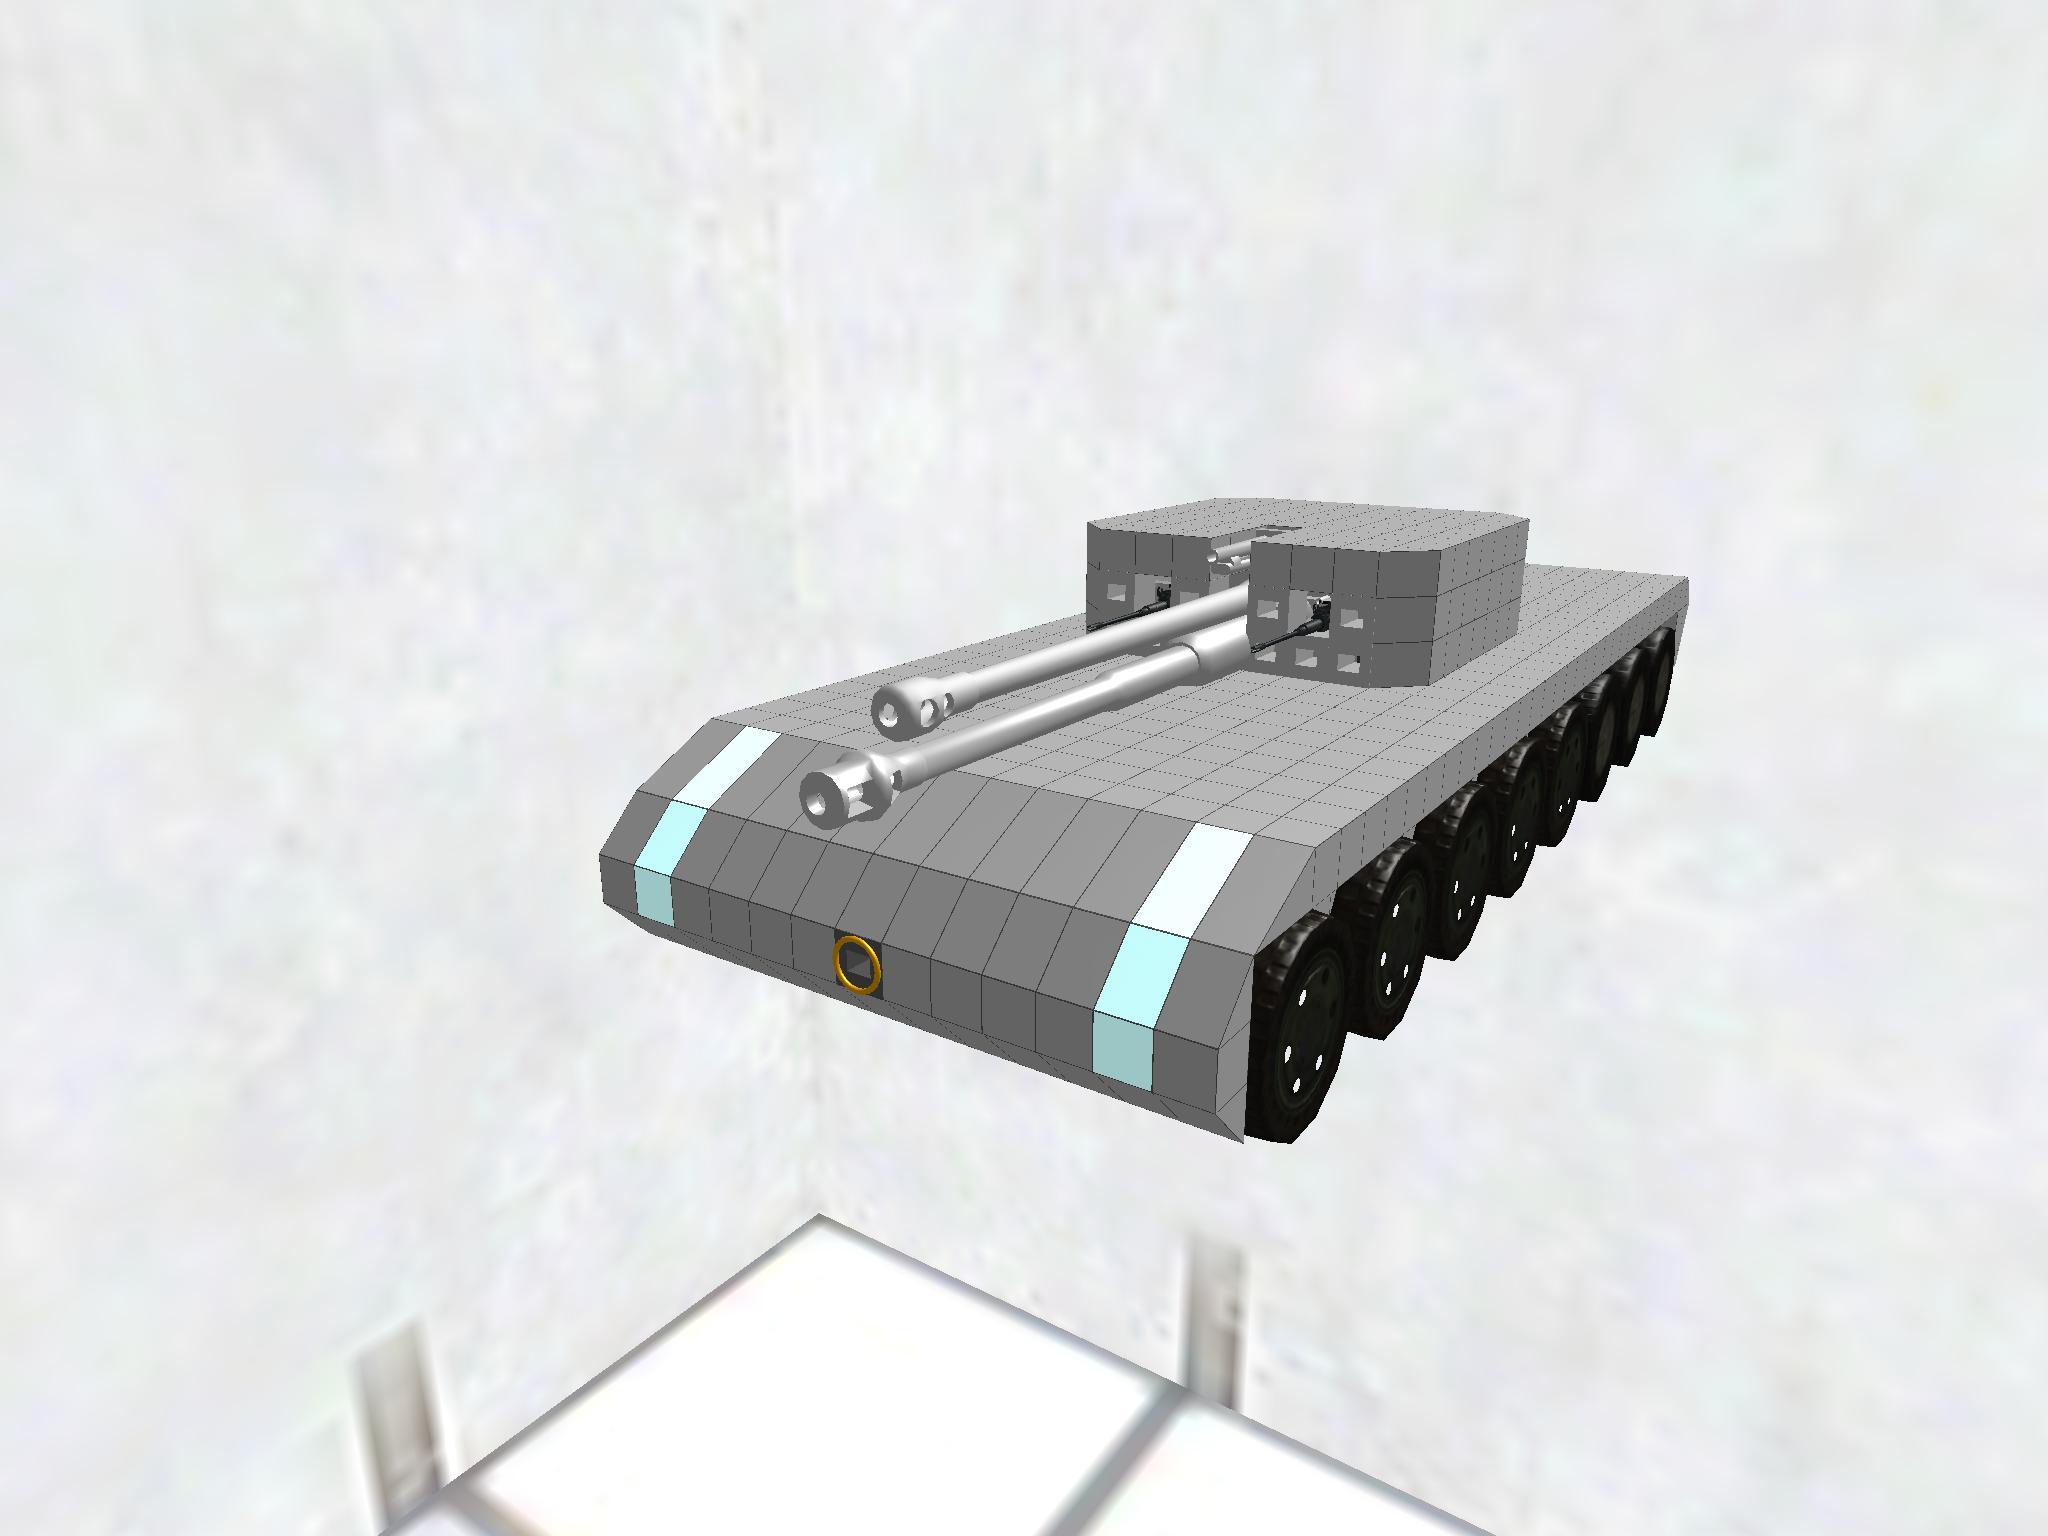 Voltic Model CLXXX Tank